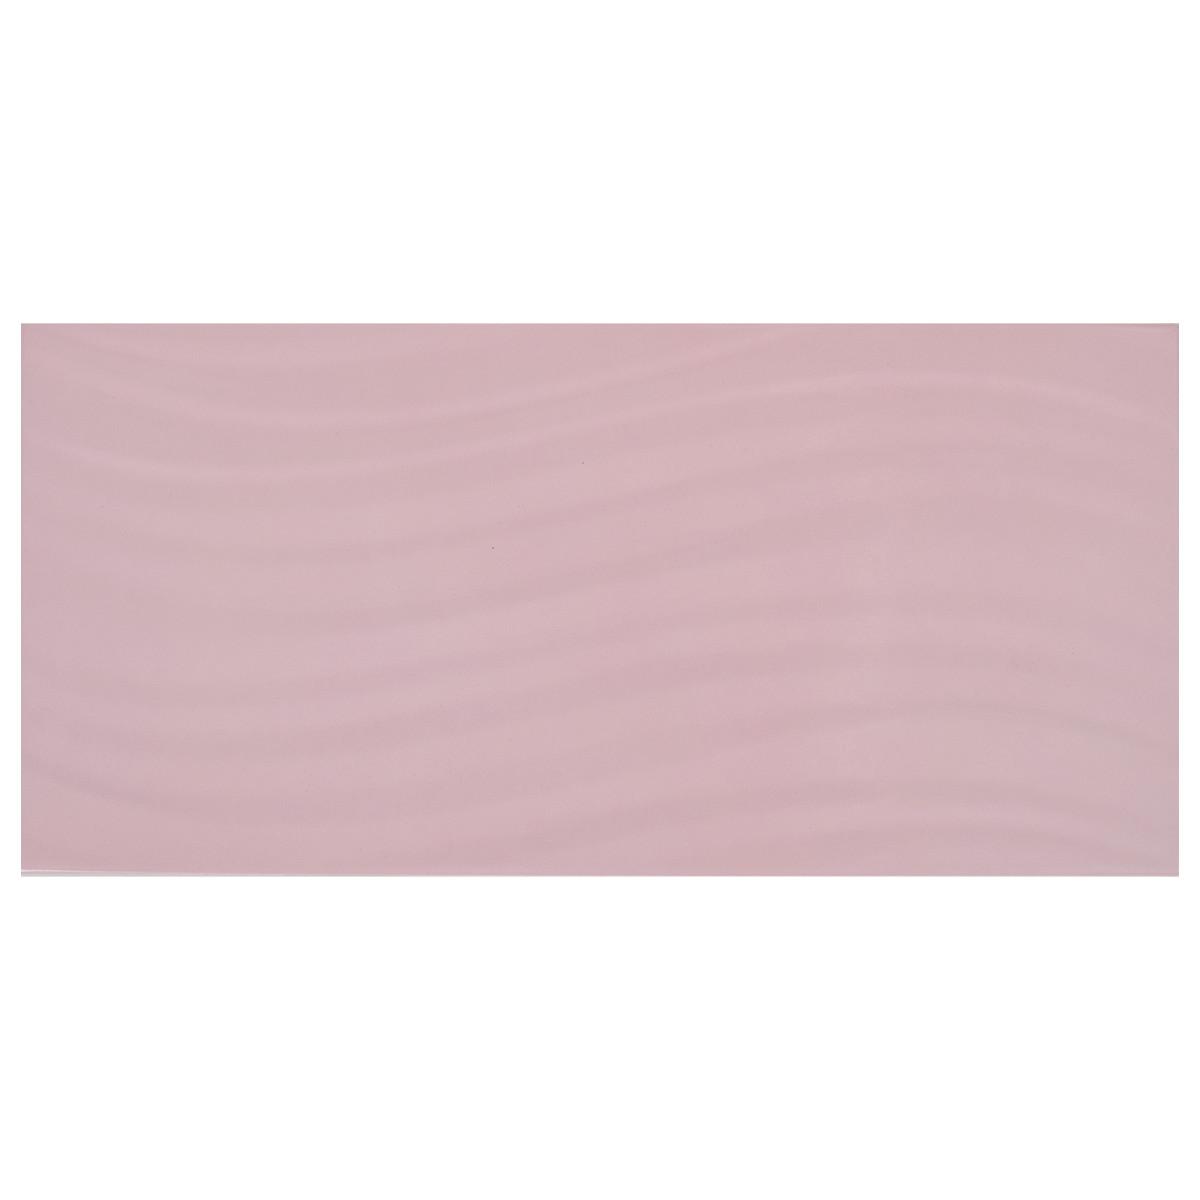 Плитка настенная Fortuna GT 39.8х19.8 см 1.58 м2 цвет светло-розовый